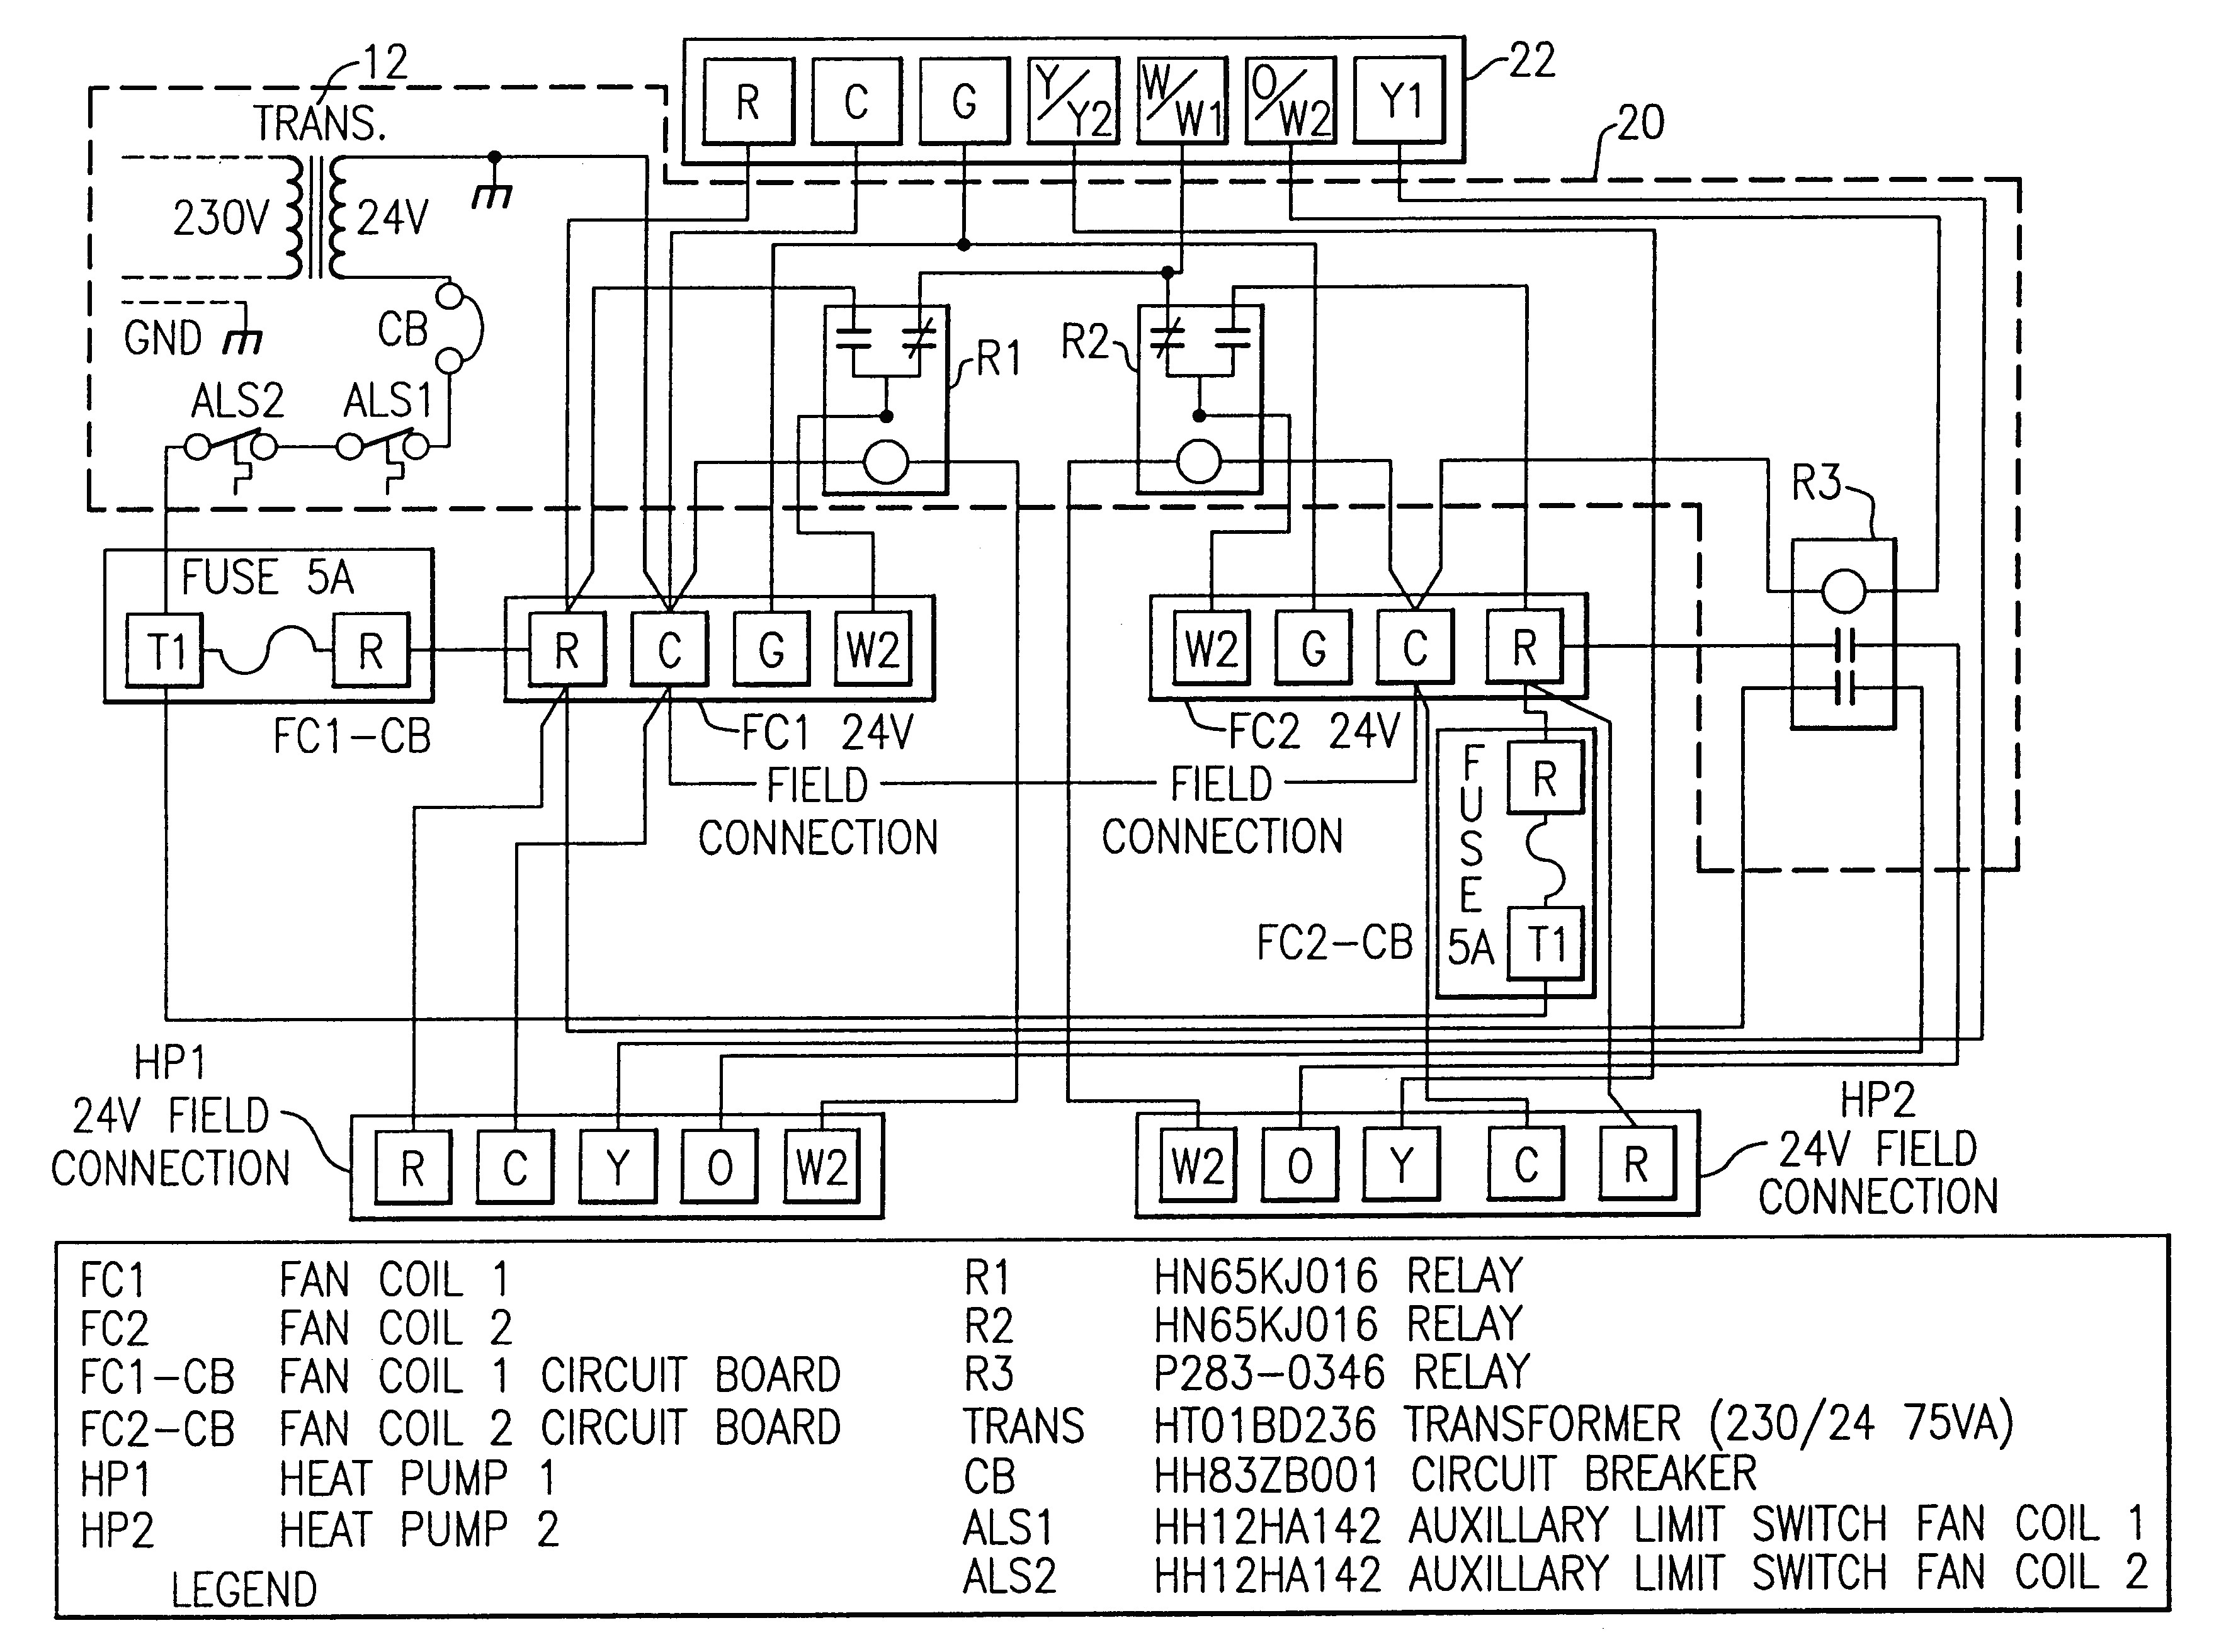 carrier heat pump wiring diagram old carrier wiring diagram wiring rh detoxicrecenze com Carrier Thermostat Wiring Diagram old carrier furnace wiring diagram